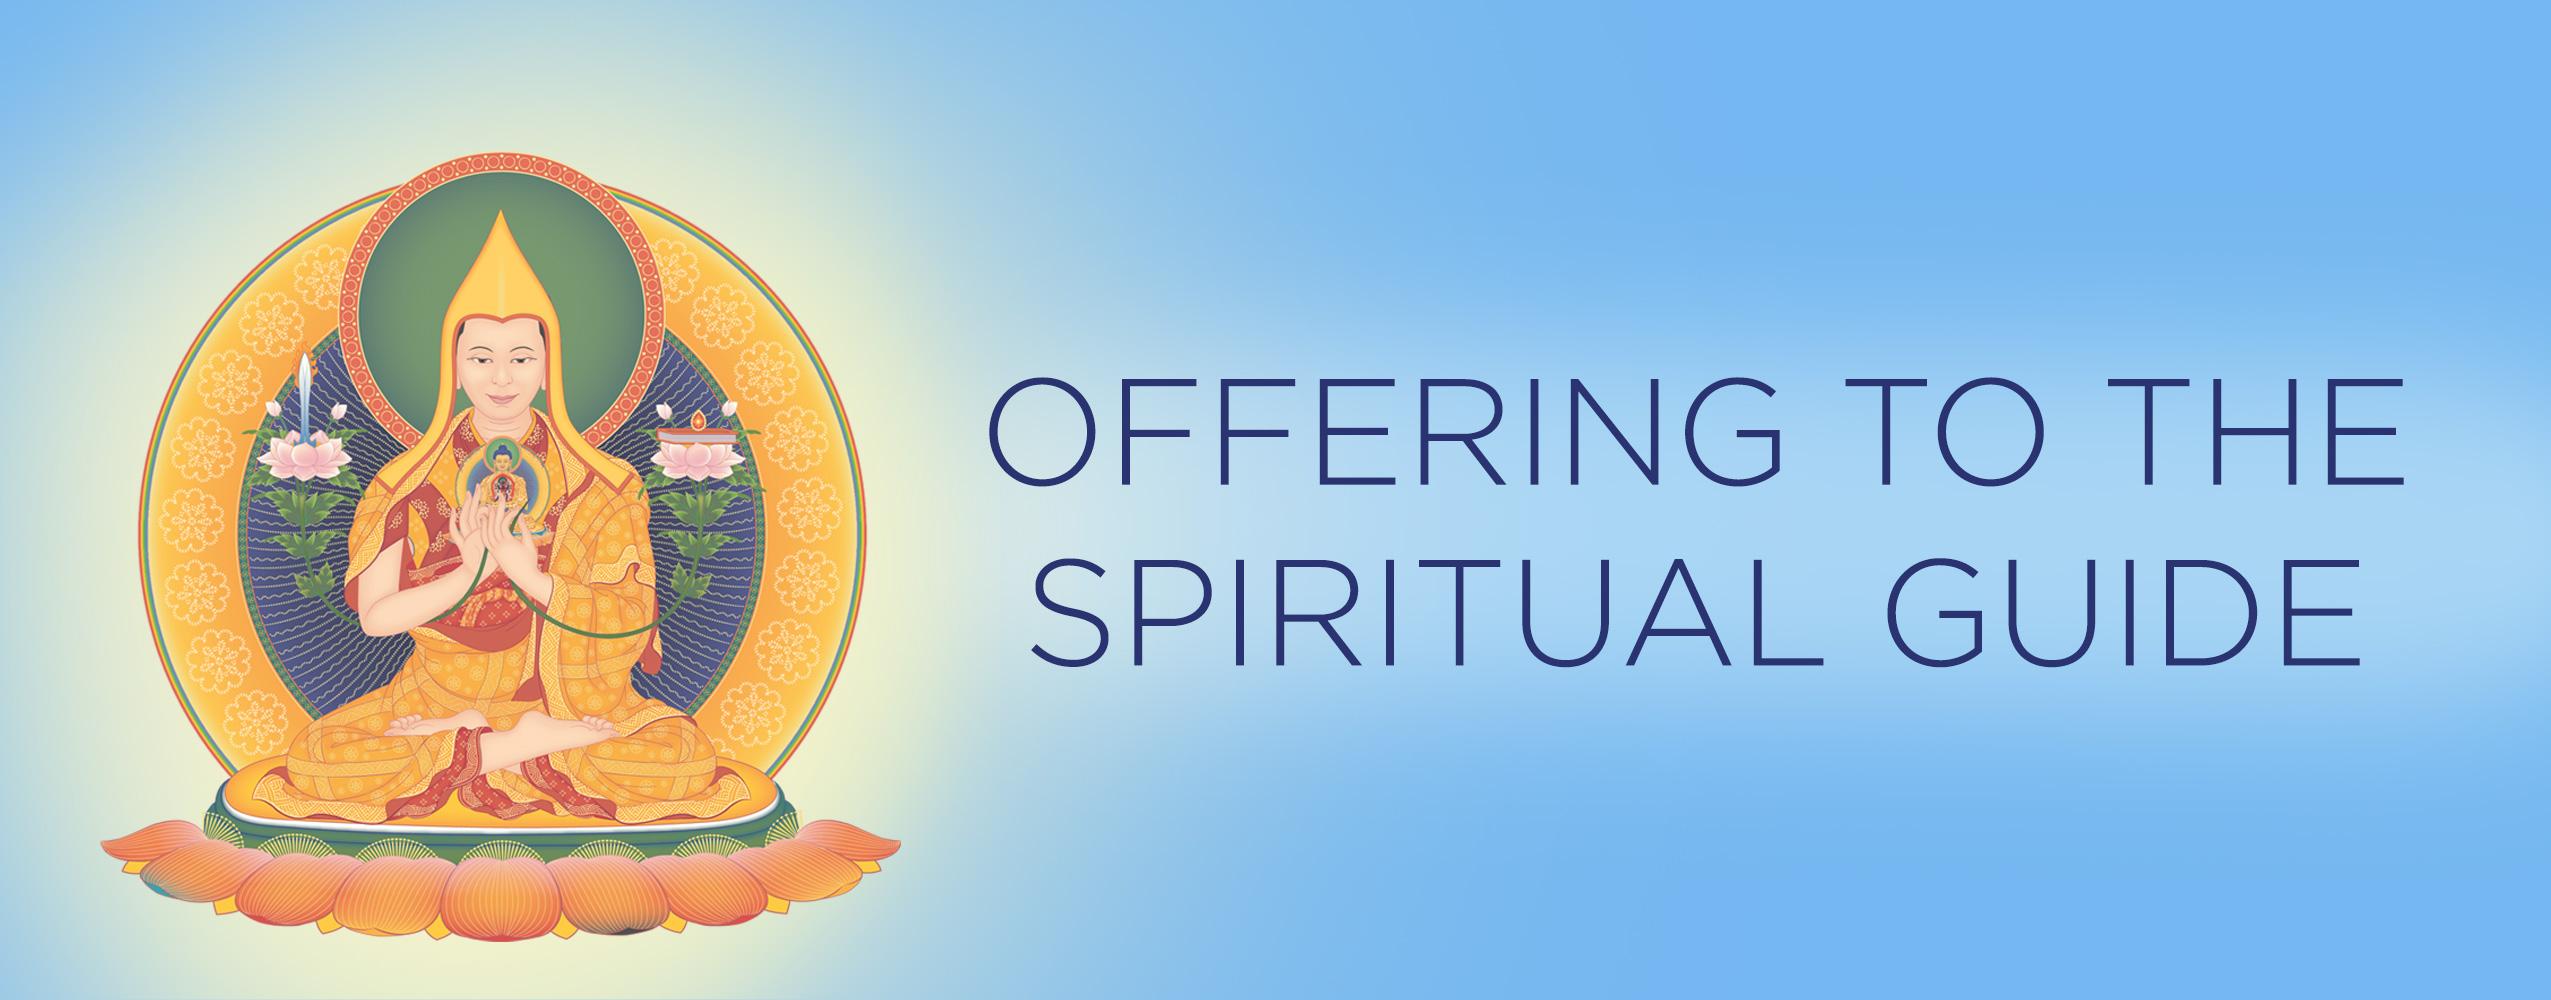 Offering to the Spiritual Guide Prayers @ Maitreya Kadampa Buddhist Center